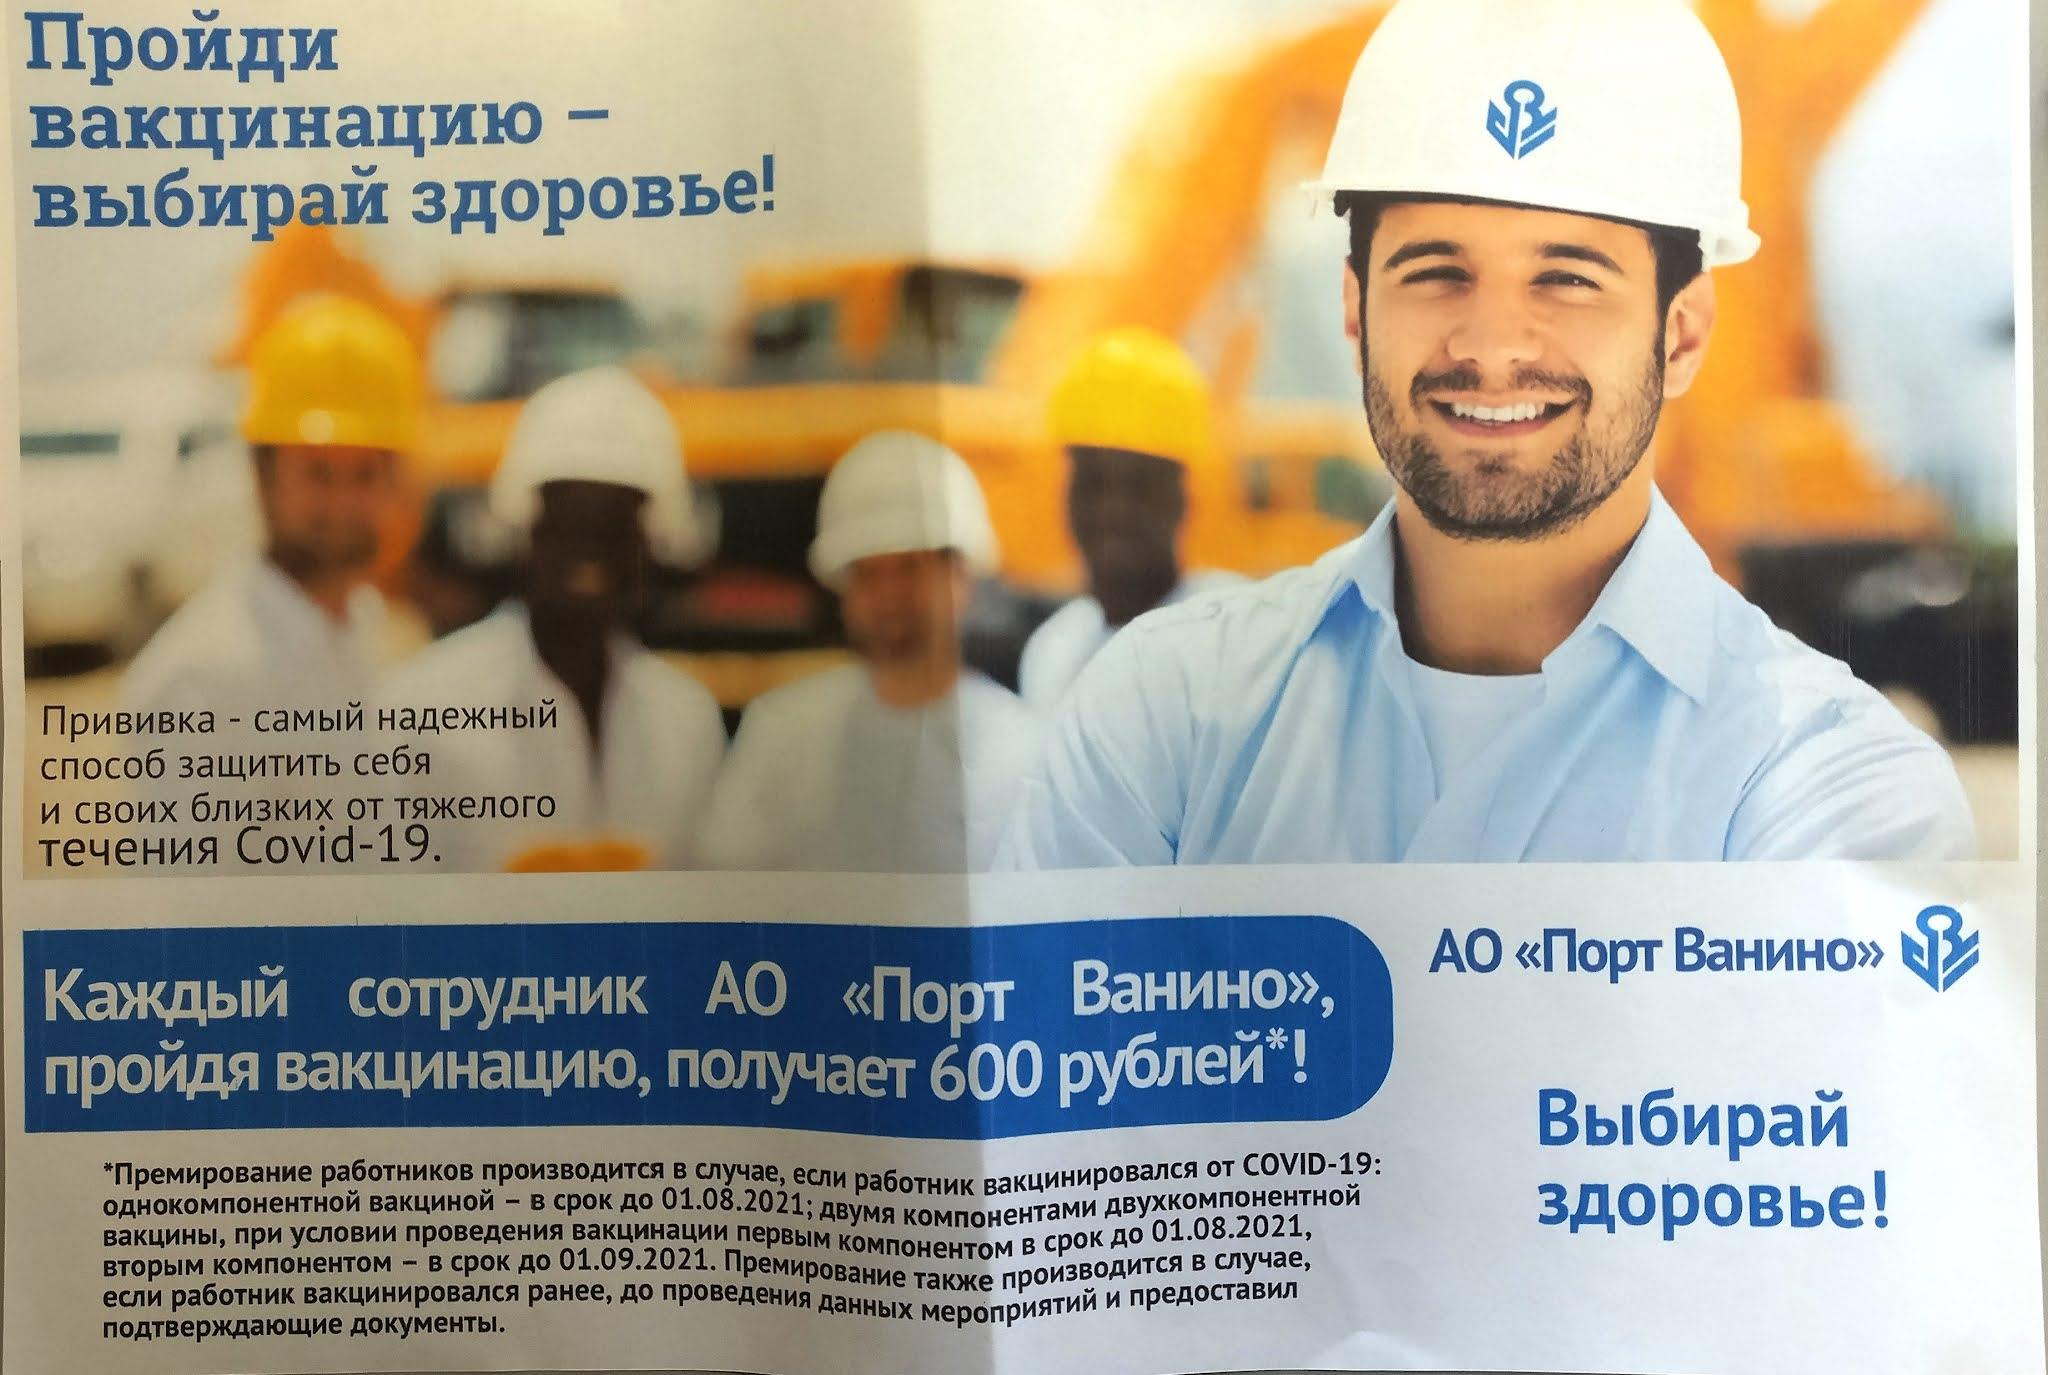 "АО ""порт Ванино"" призыв на вакцинацию за 600 рублей"